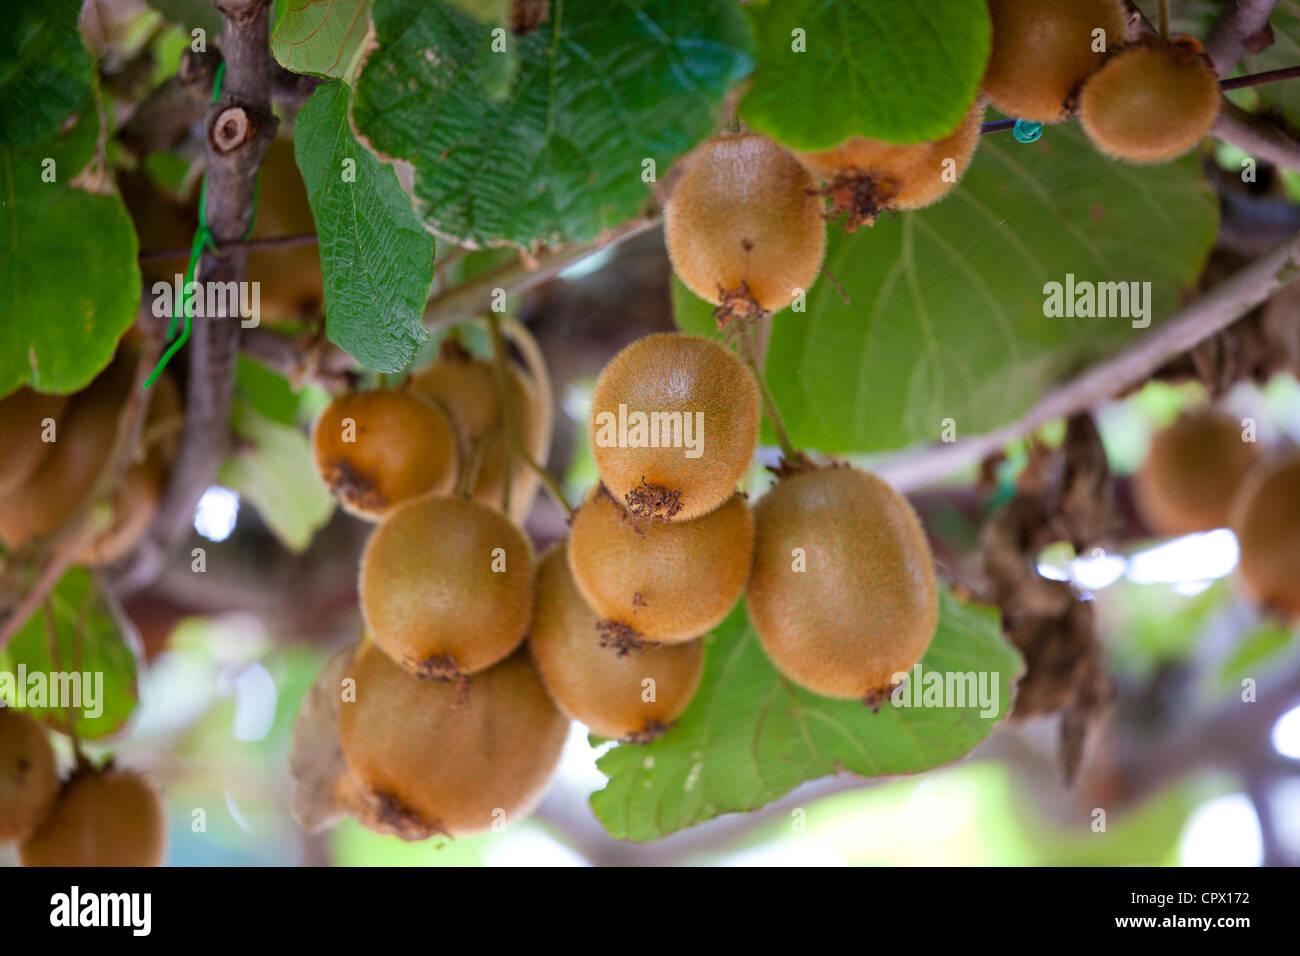 Kiwifrucht wächst Landgut von La Fornace in Montalcino in Val D'Orcia, Toskana, Italien Stockbild